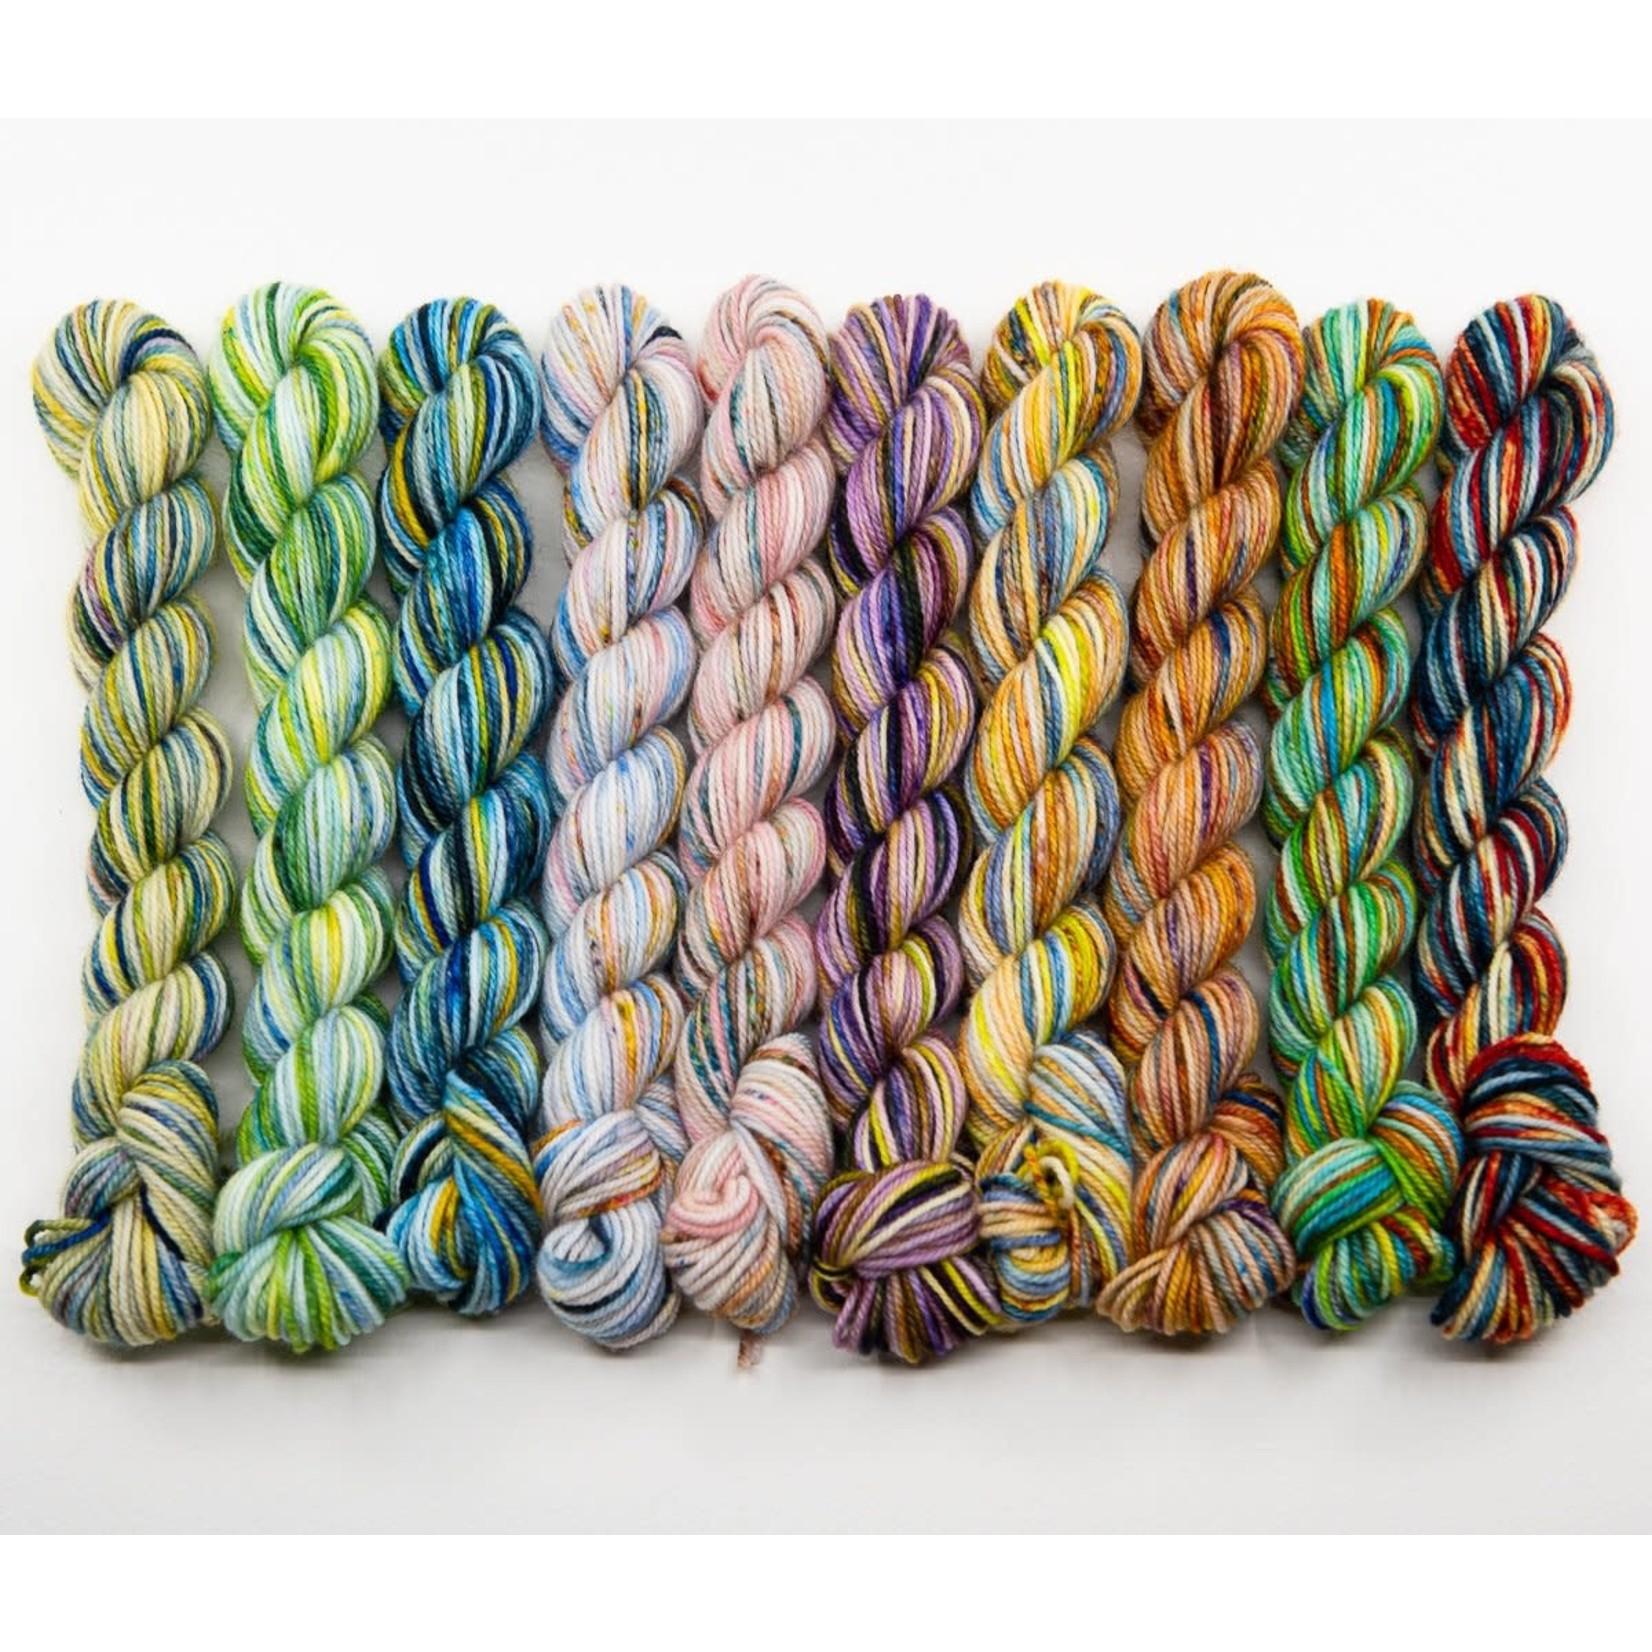 Ancient Arts Yarns Bundle of 10 - New colourways